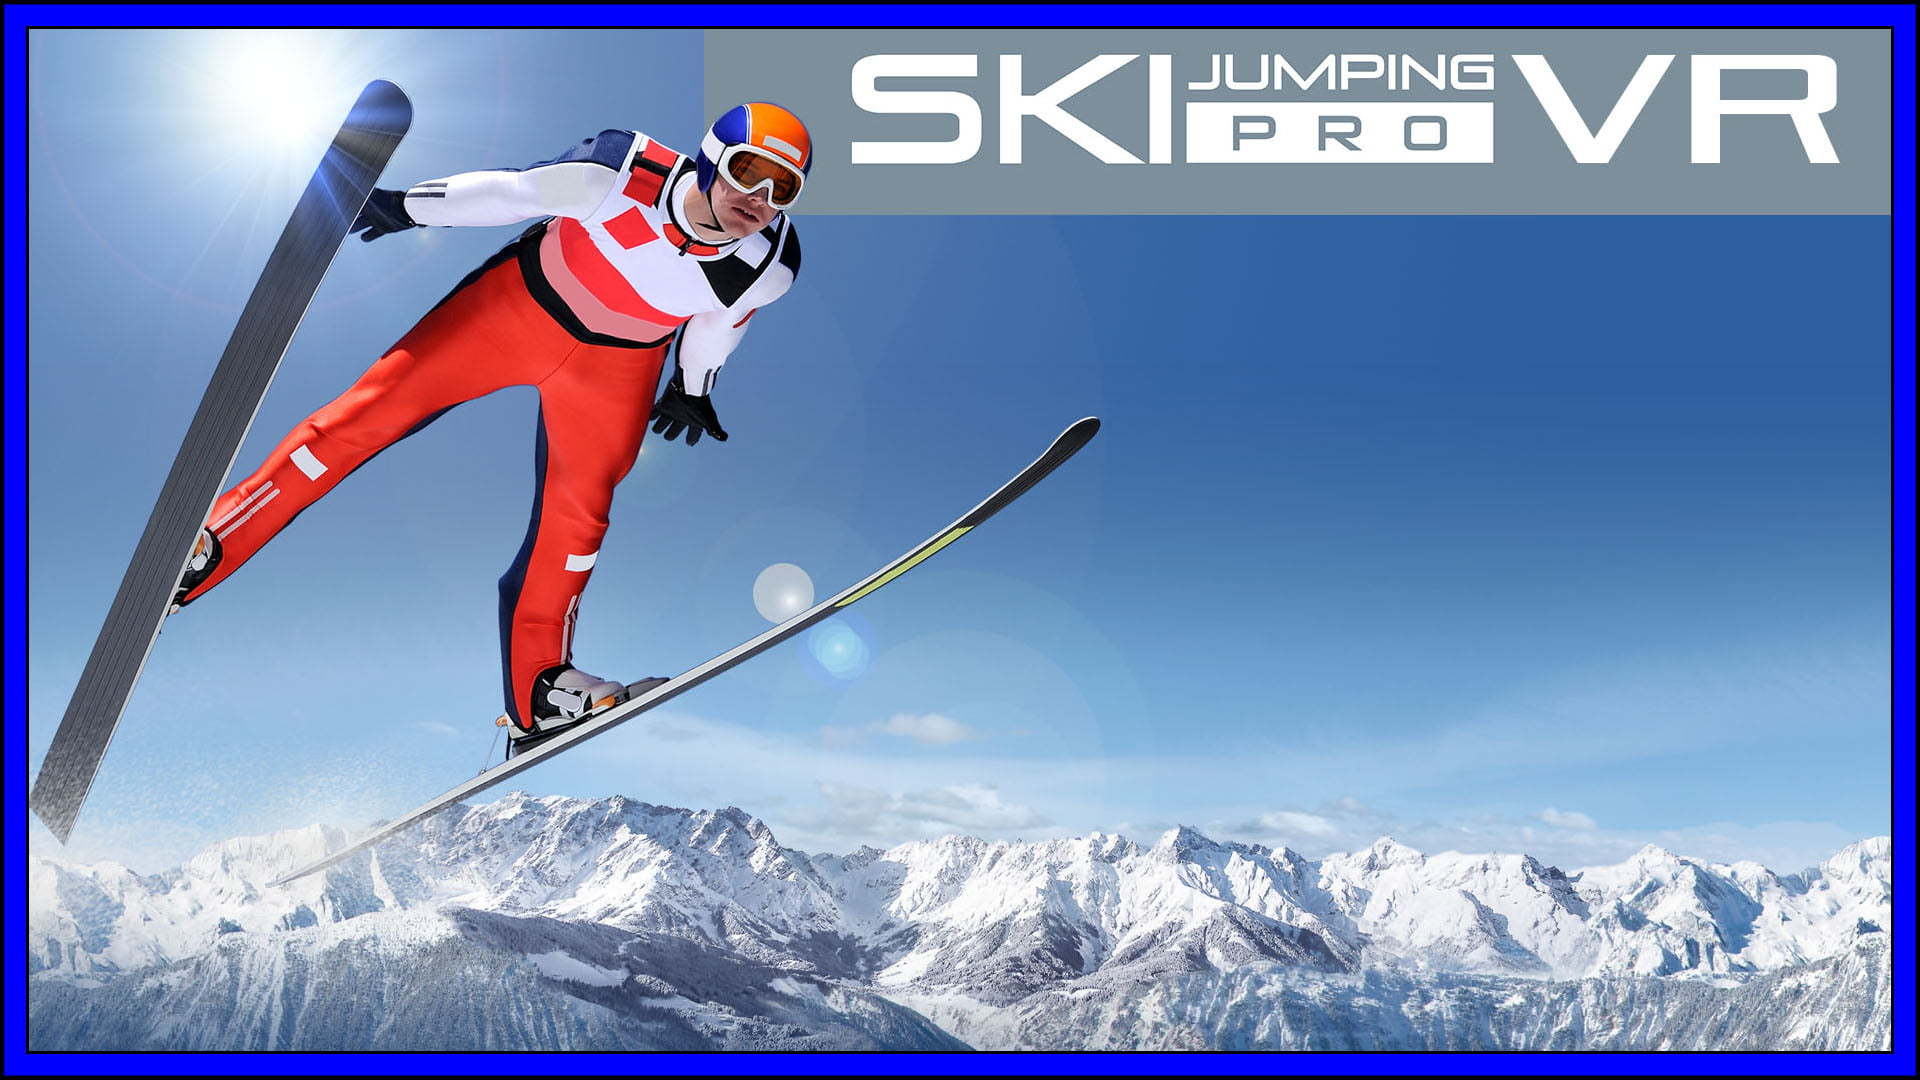 Ski Jumping Pro VR (PSVR) Review